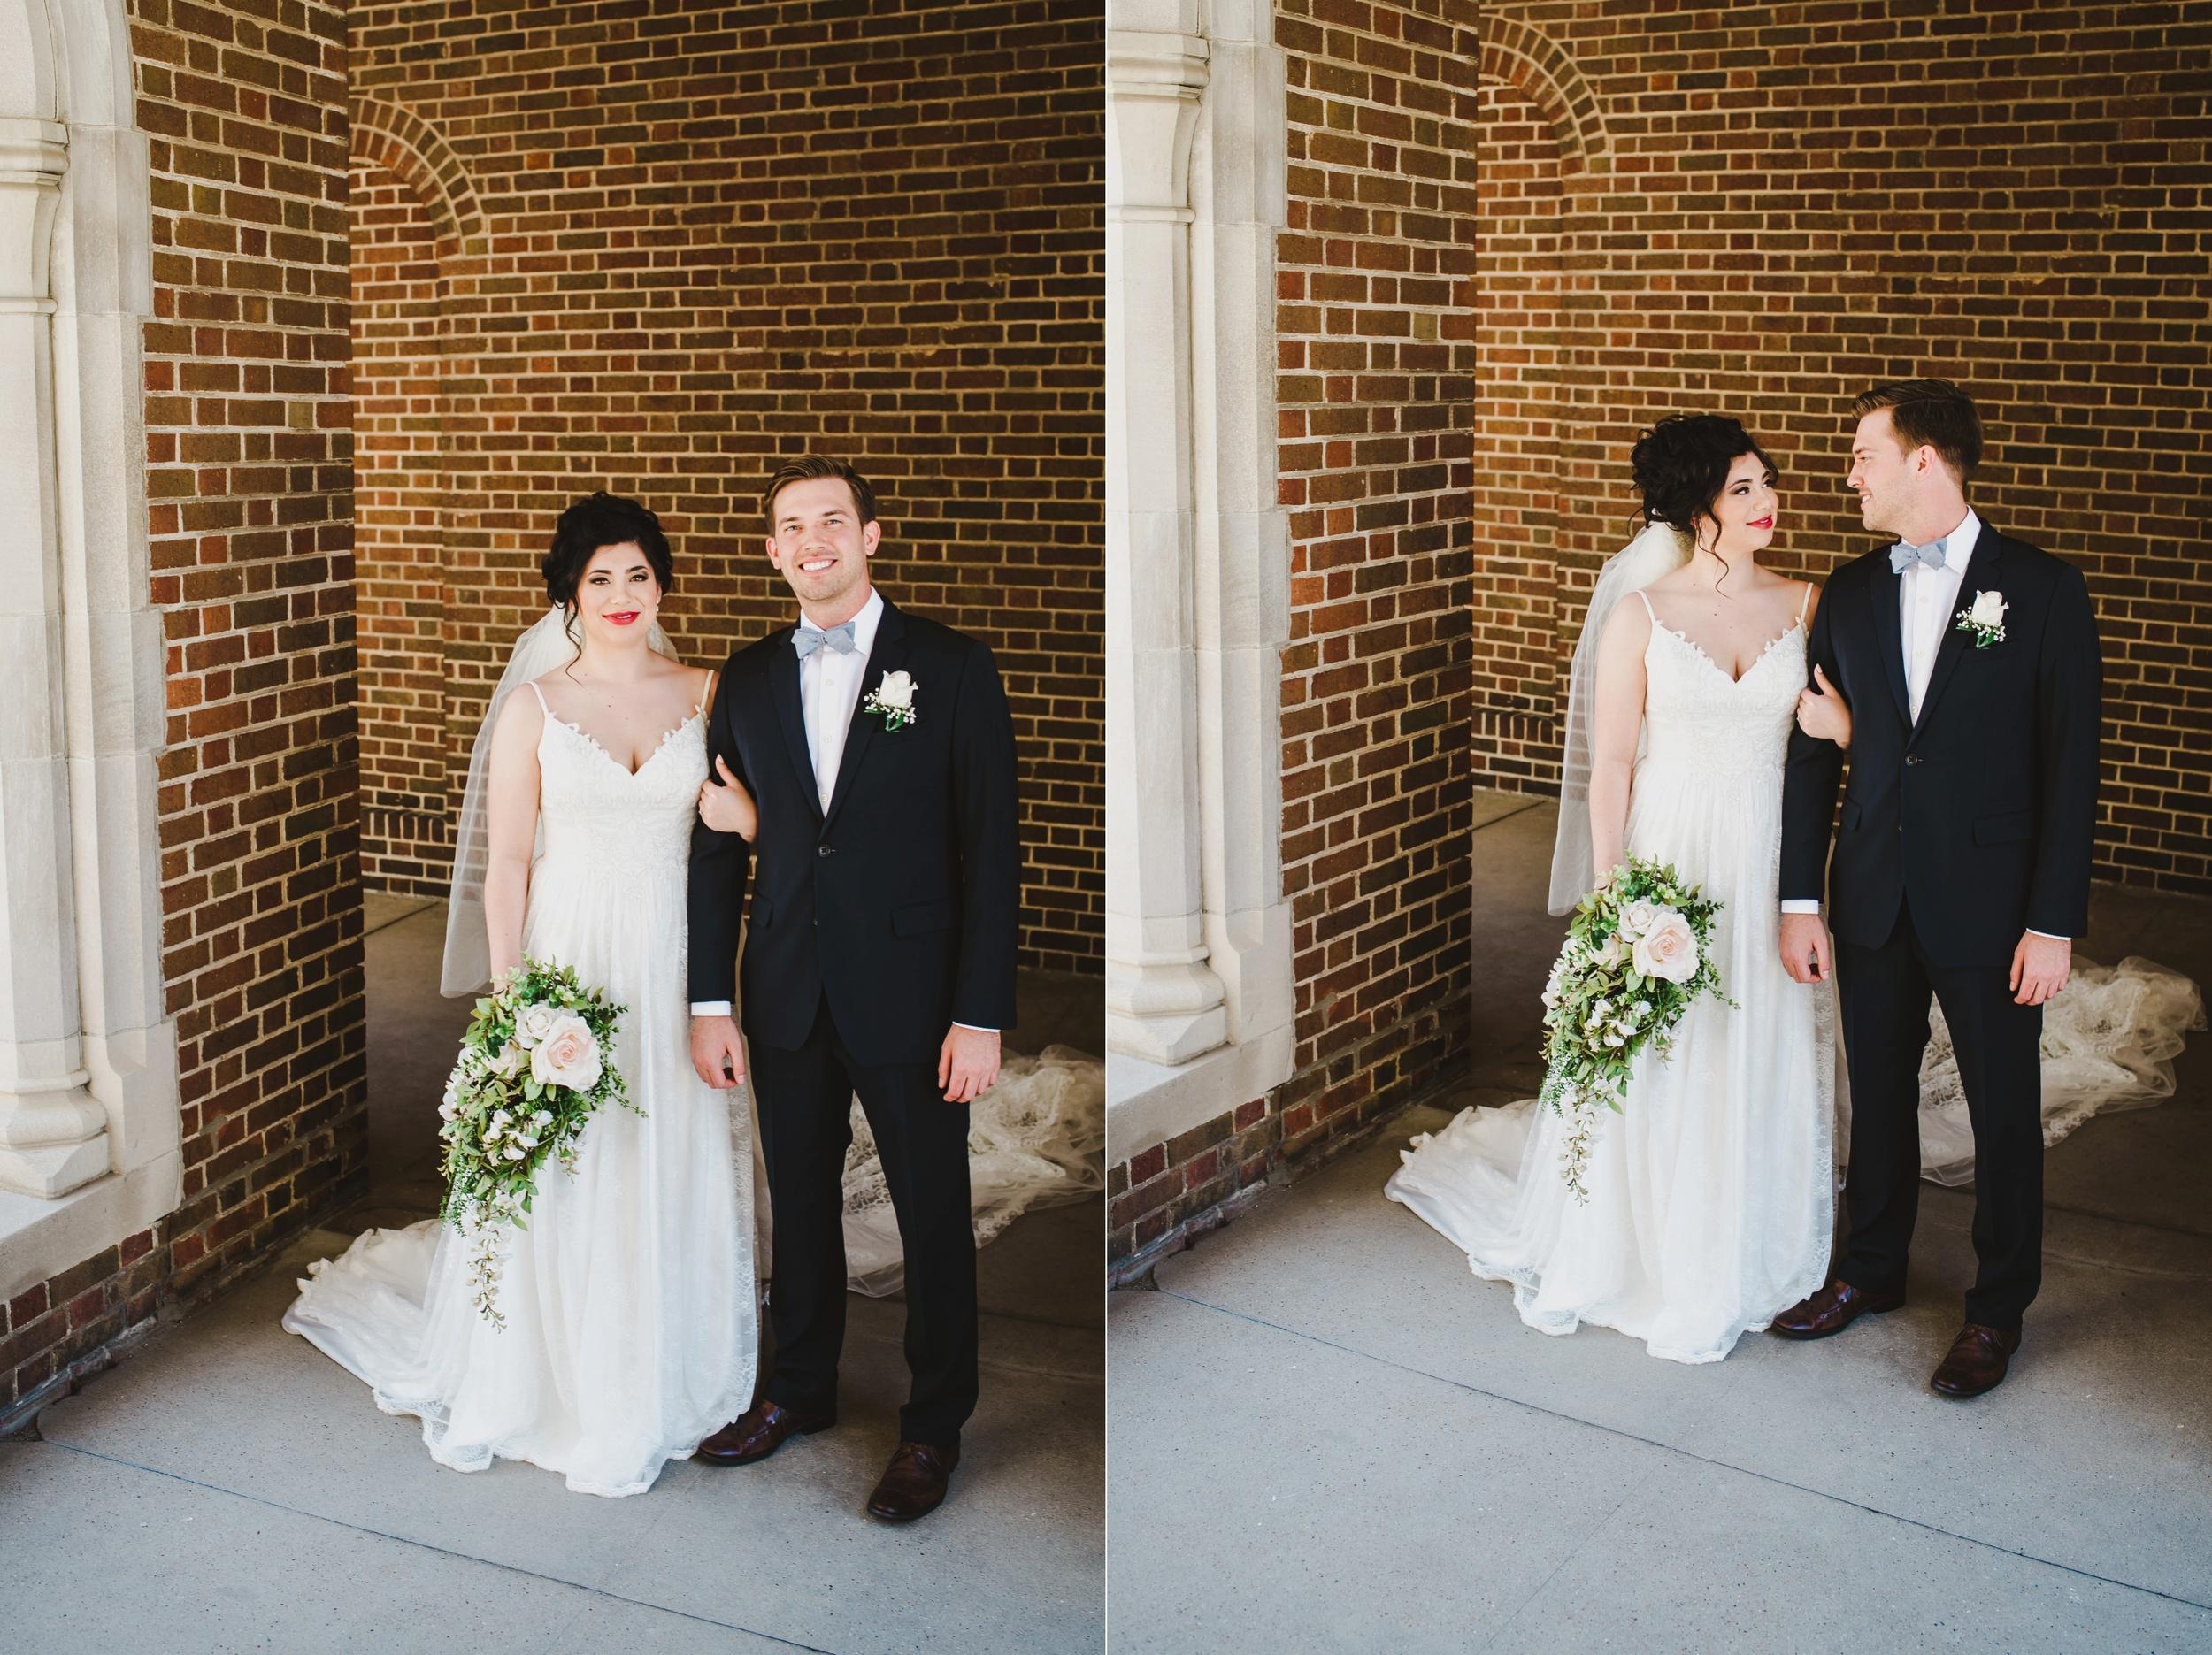 West End Architectural Salvage Wedding Photographer_2543.jpg